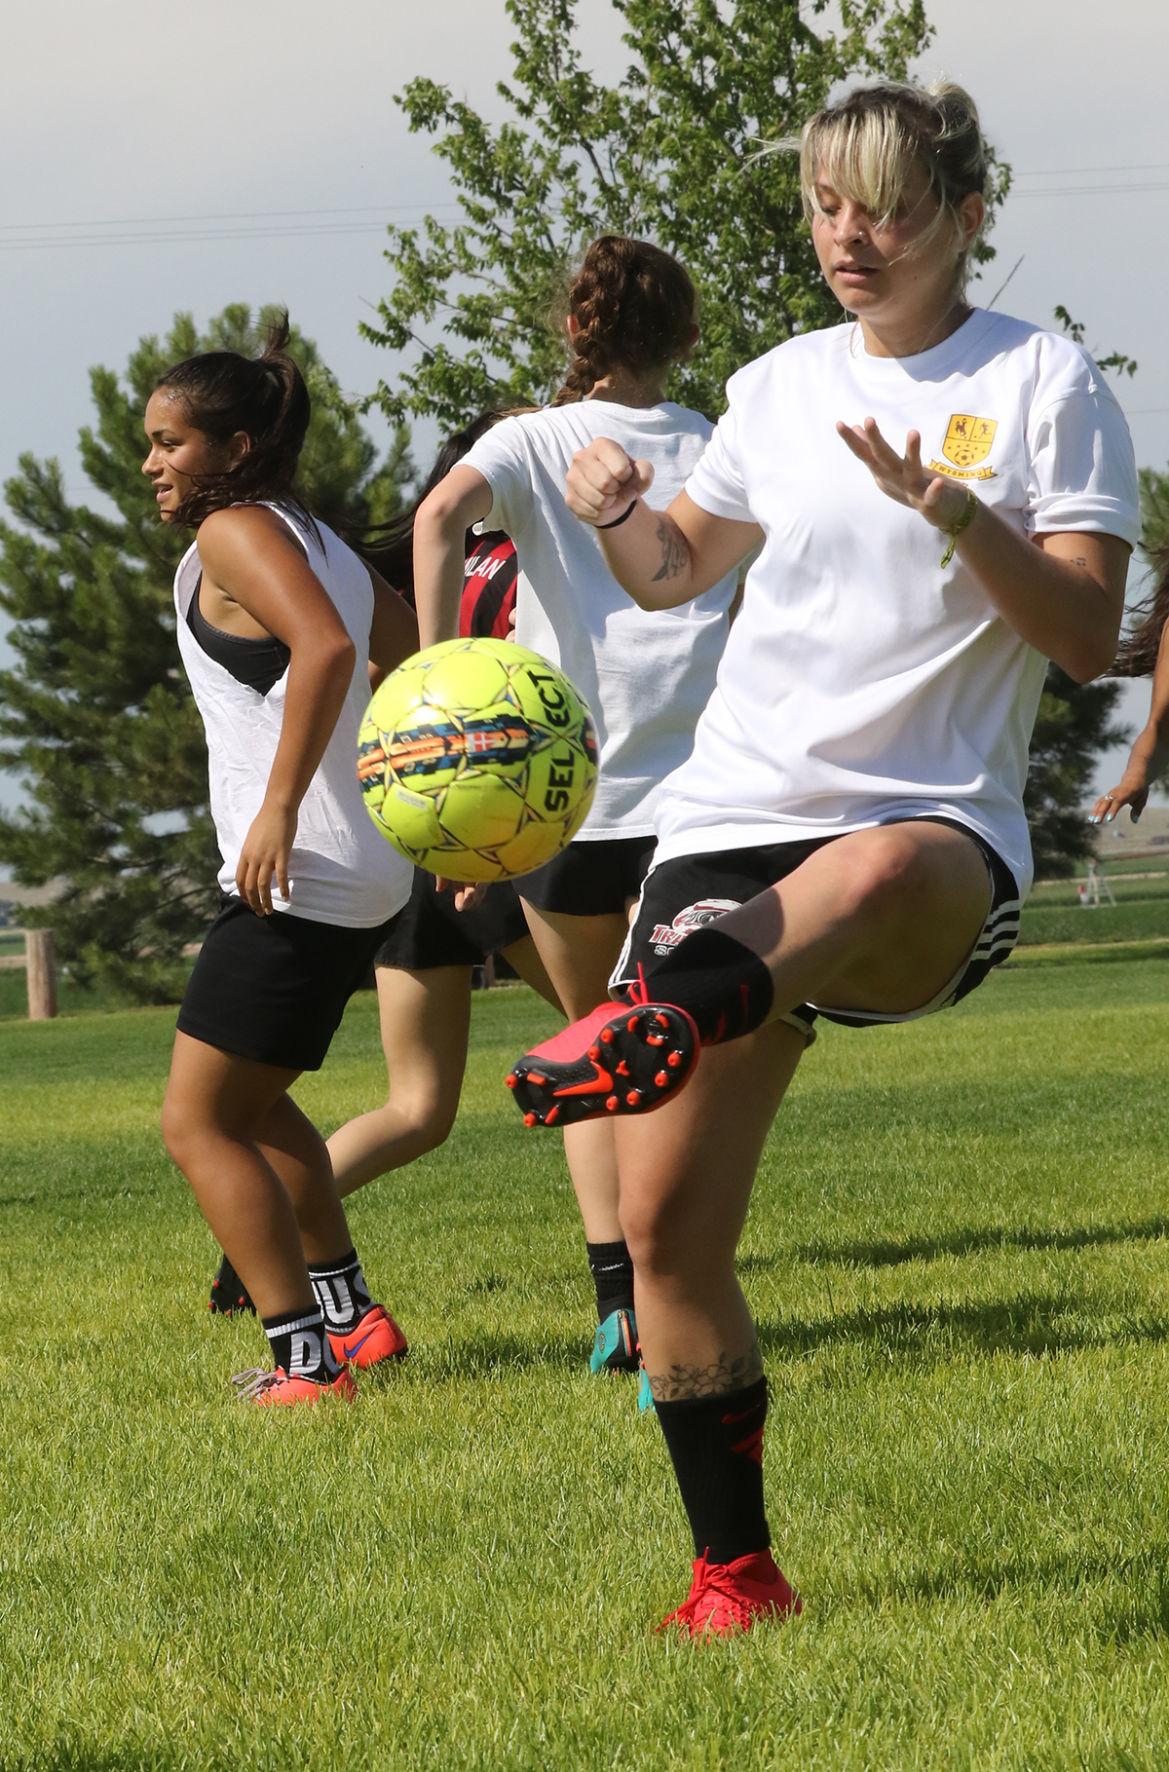 Photos: WNCC soccer practice